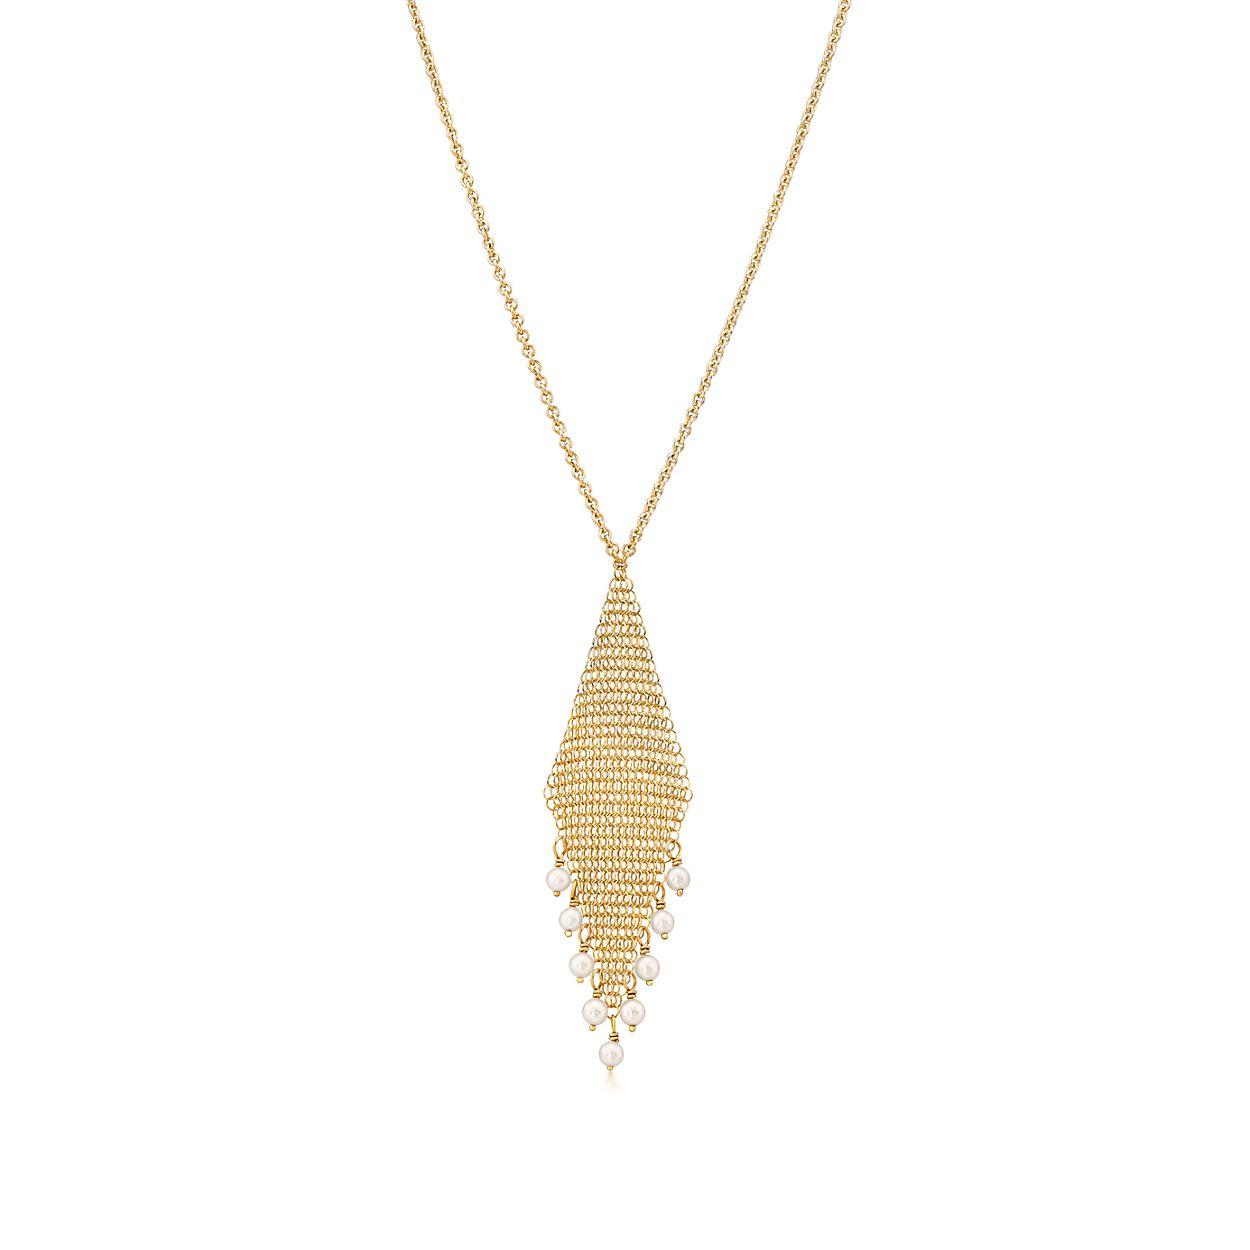 Elsa Peretti Mesh fringe earrings in 18k gold with freshwater pearls Tiffany & Co. ZzfkiBm